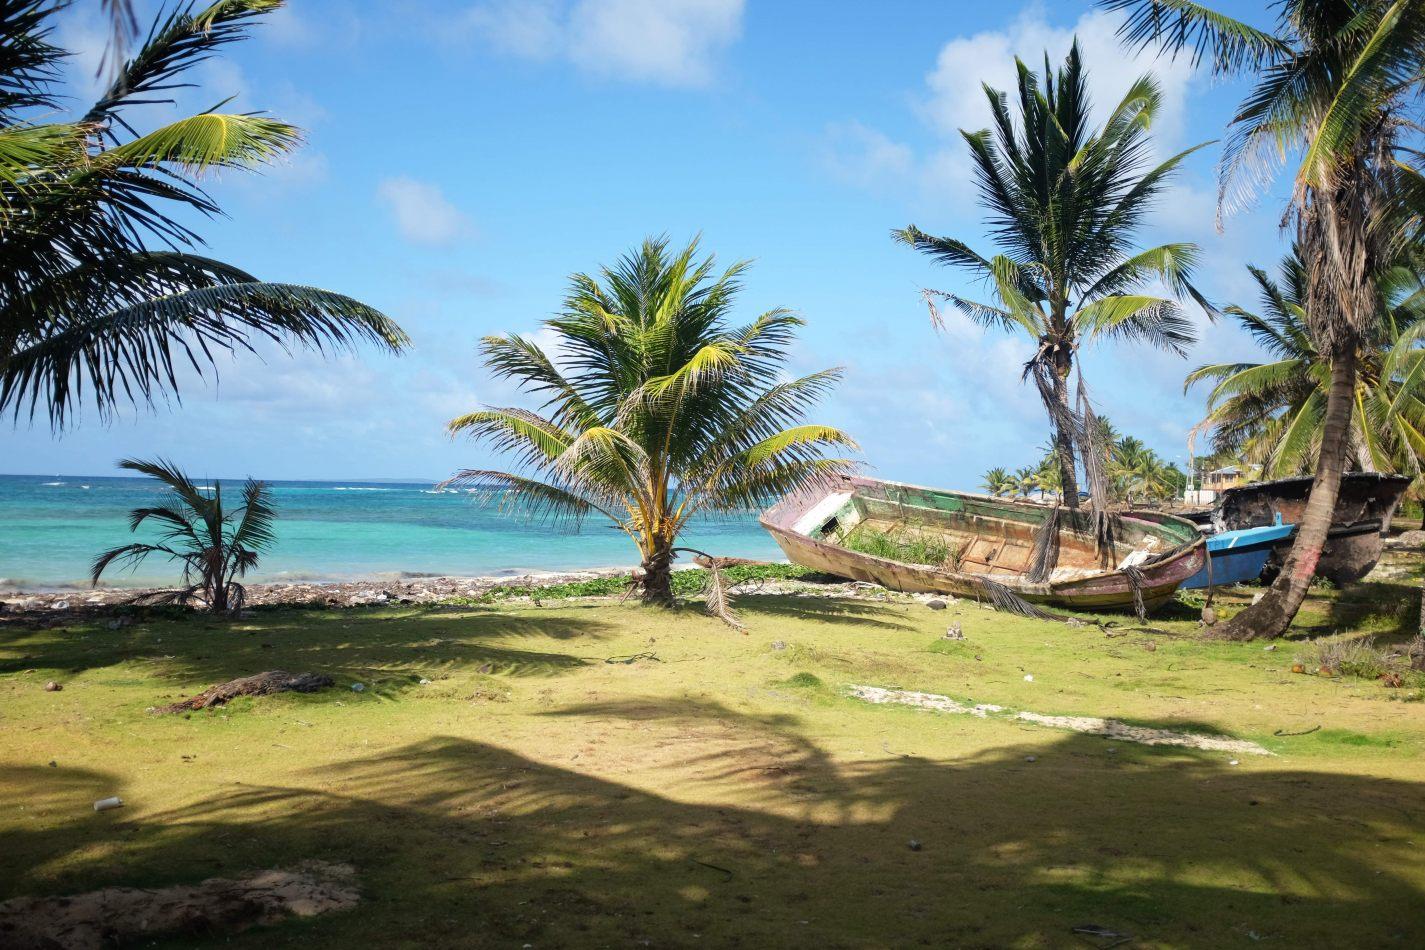 Hibiscus & Nomada : Corn Islands - Big Corn Island, North End